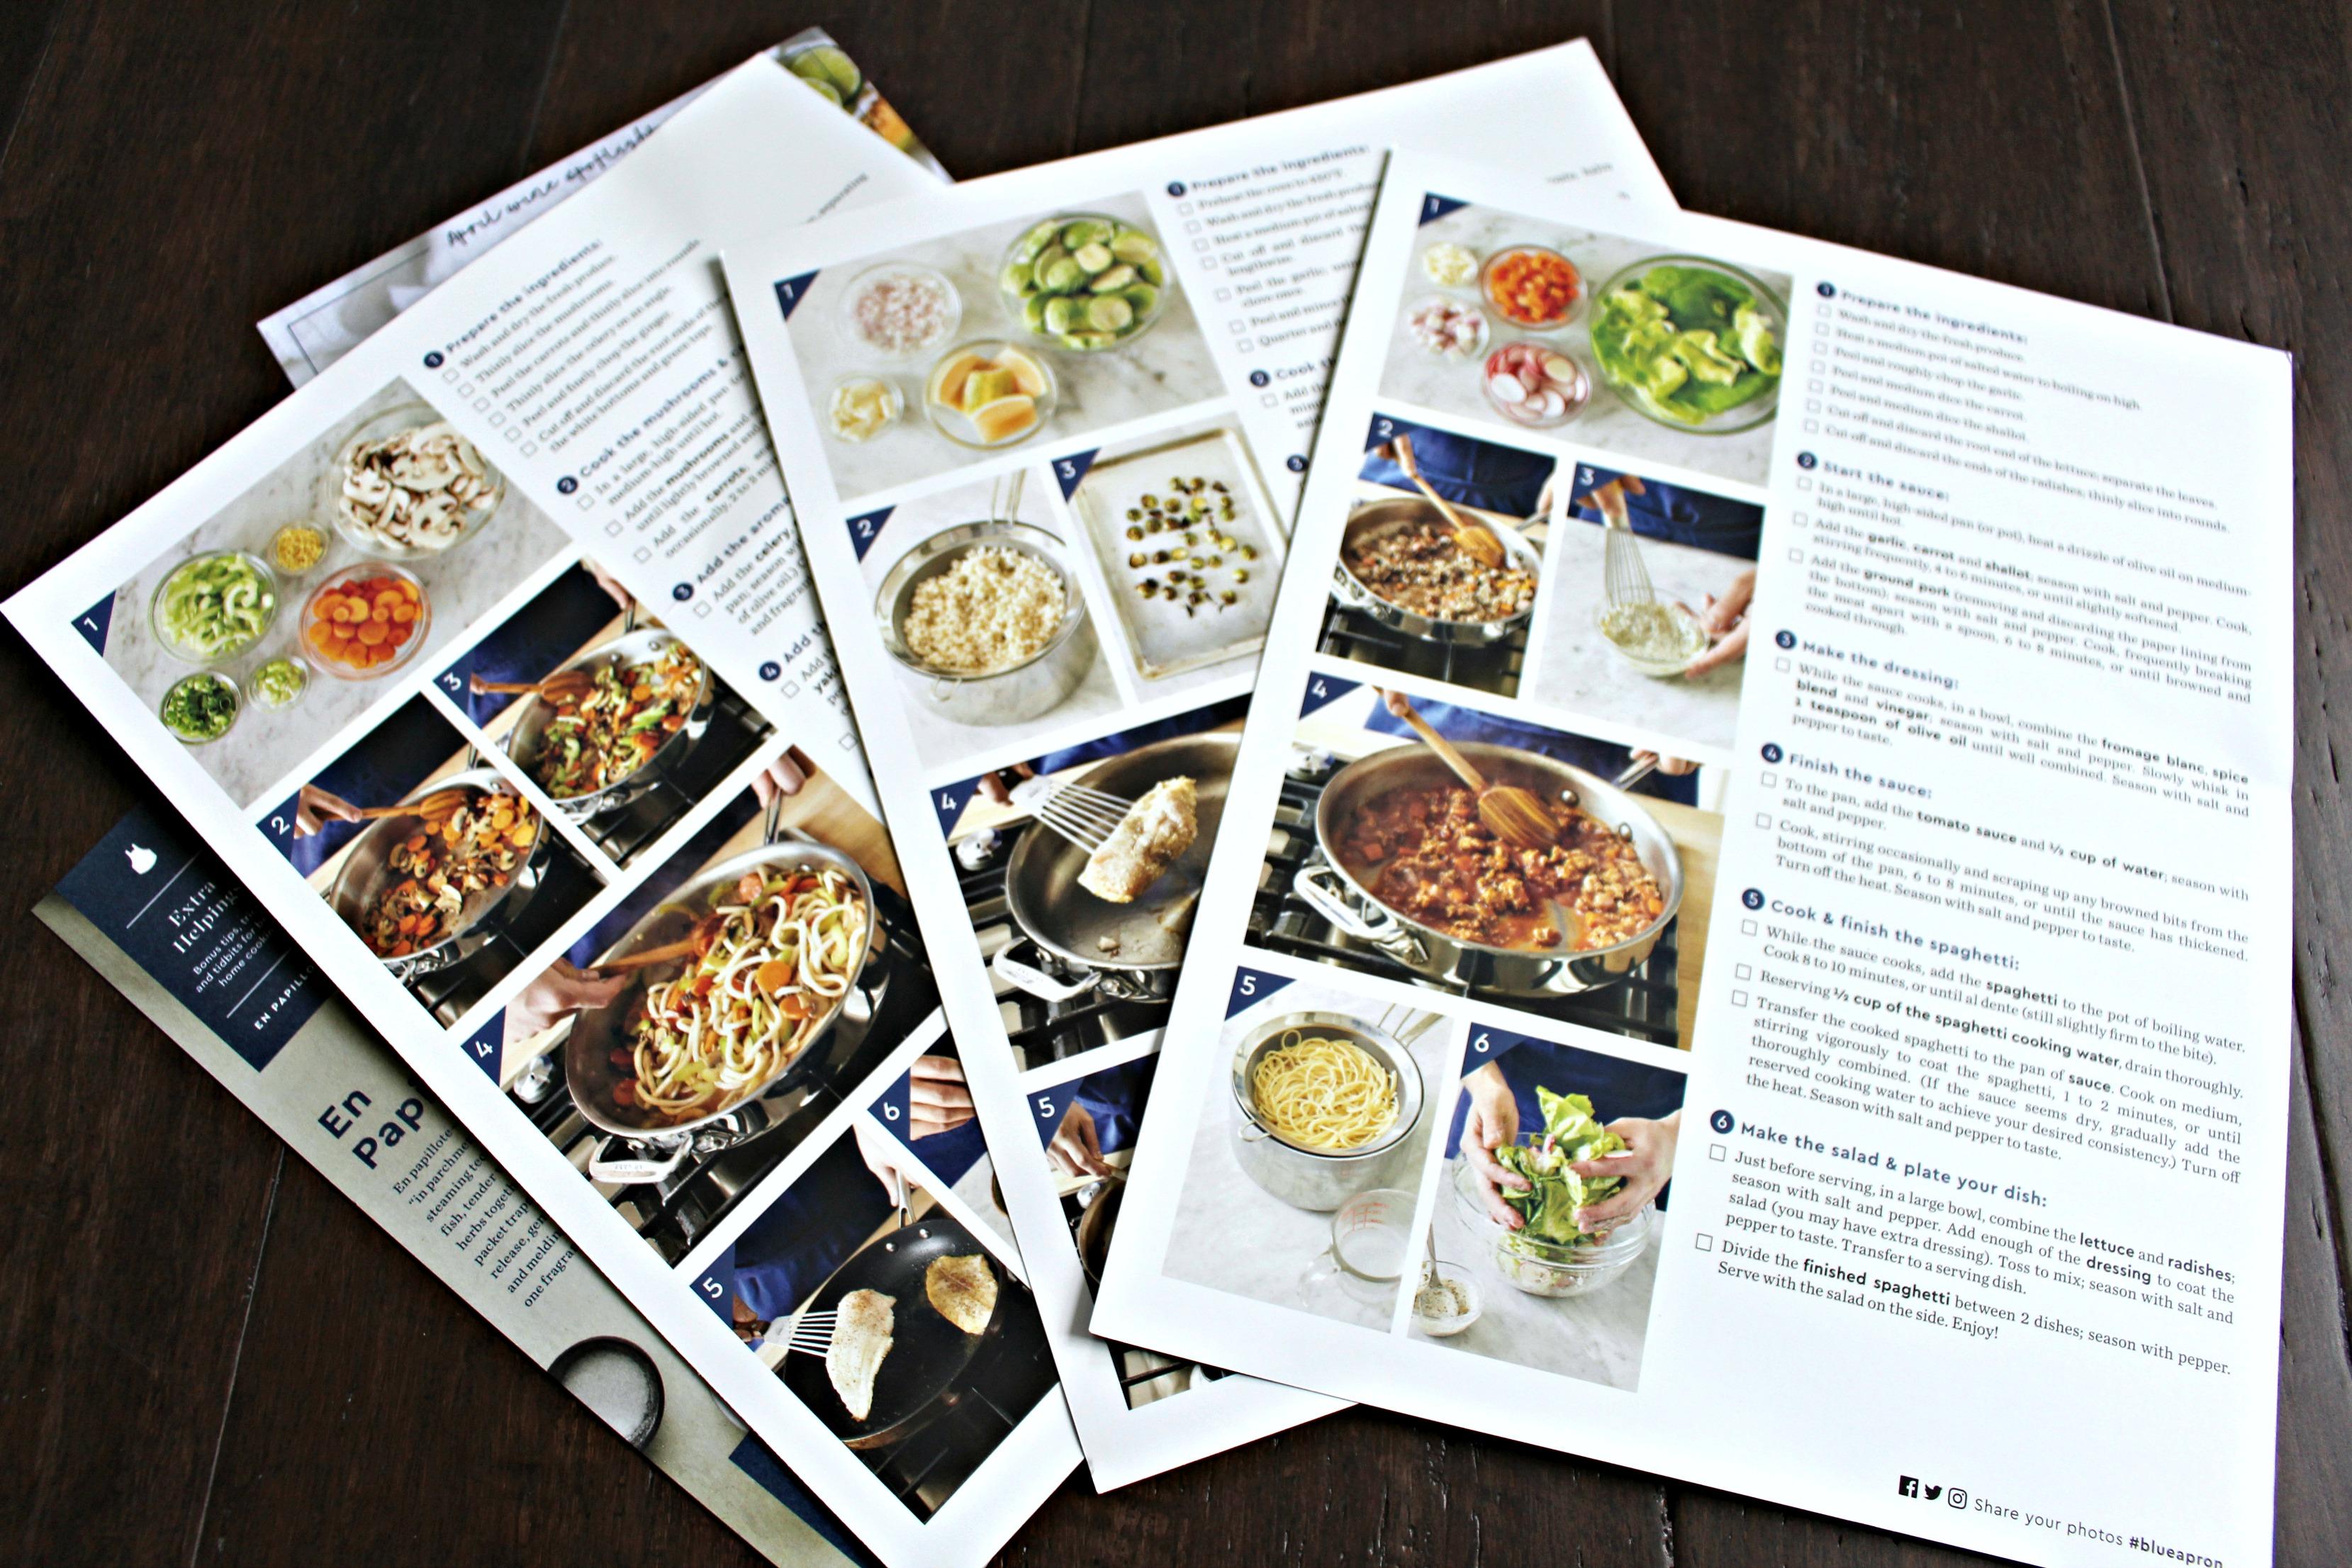 Blue apron udon noodles - Blue Apron Udon Noodles 65